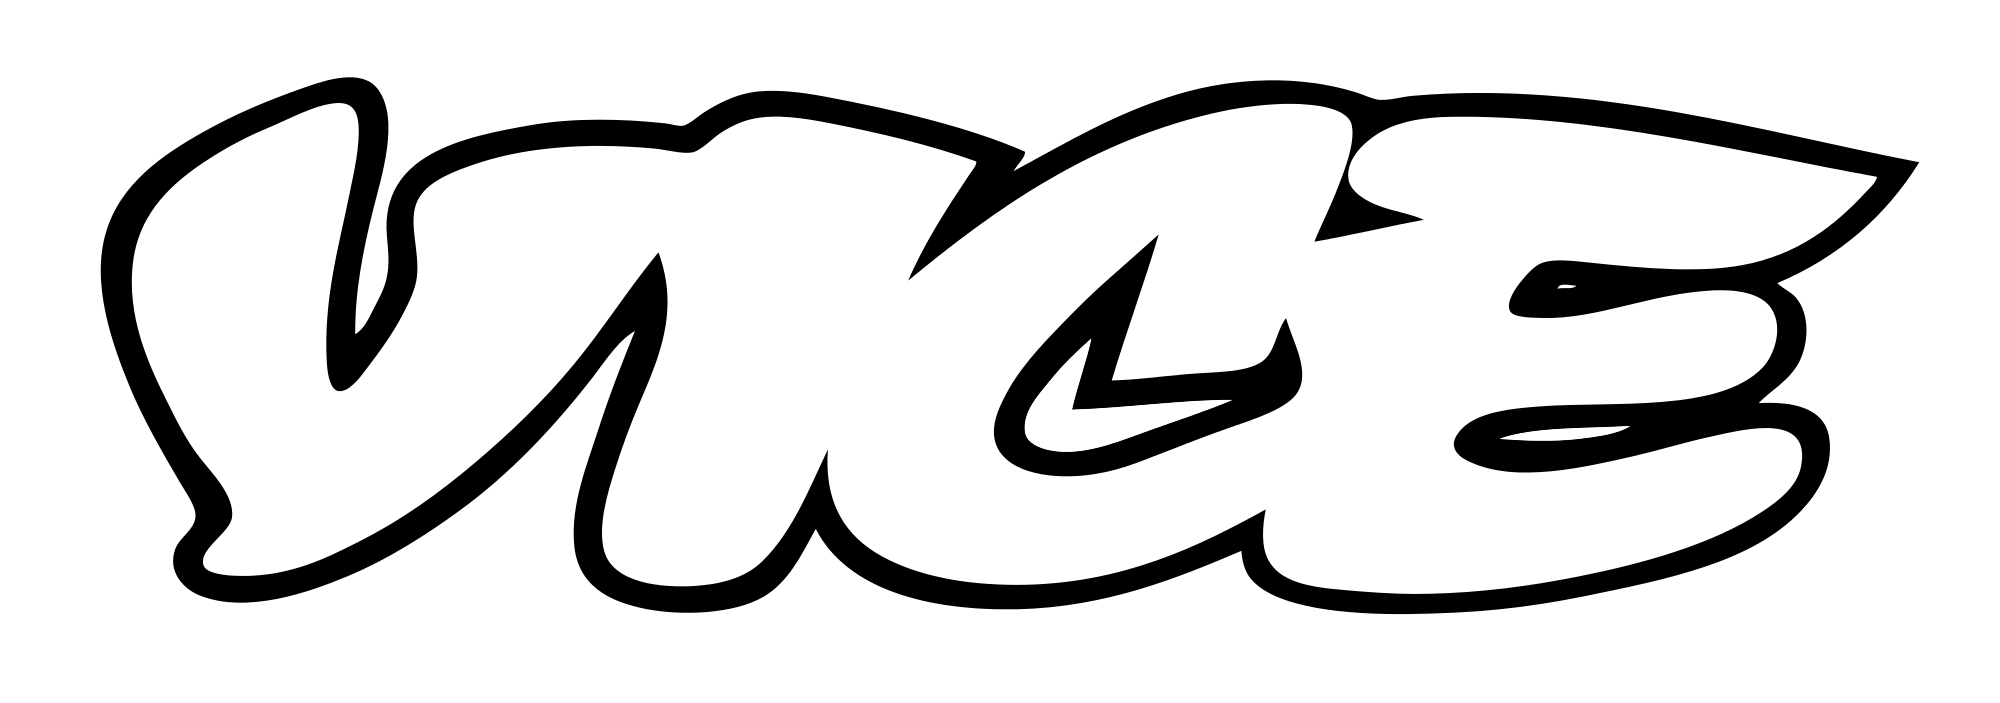 vice-logo.png